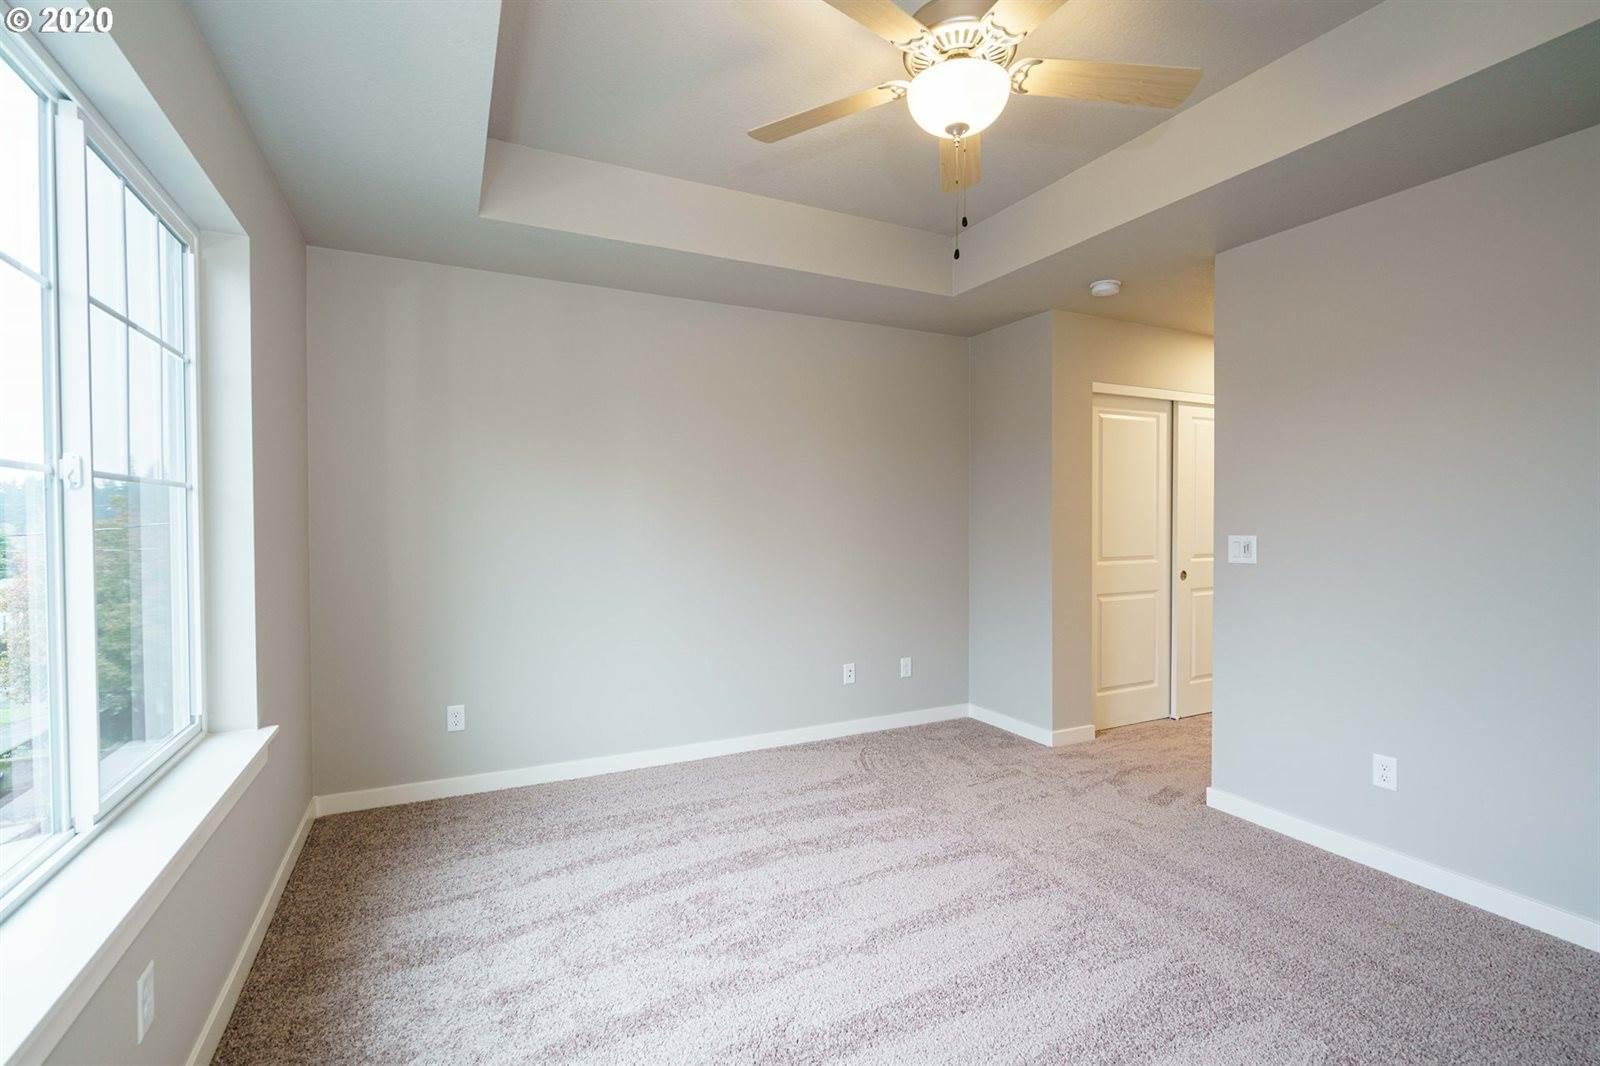 1698 NE 80 Ave, Portland, OR 97213